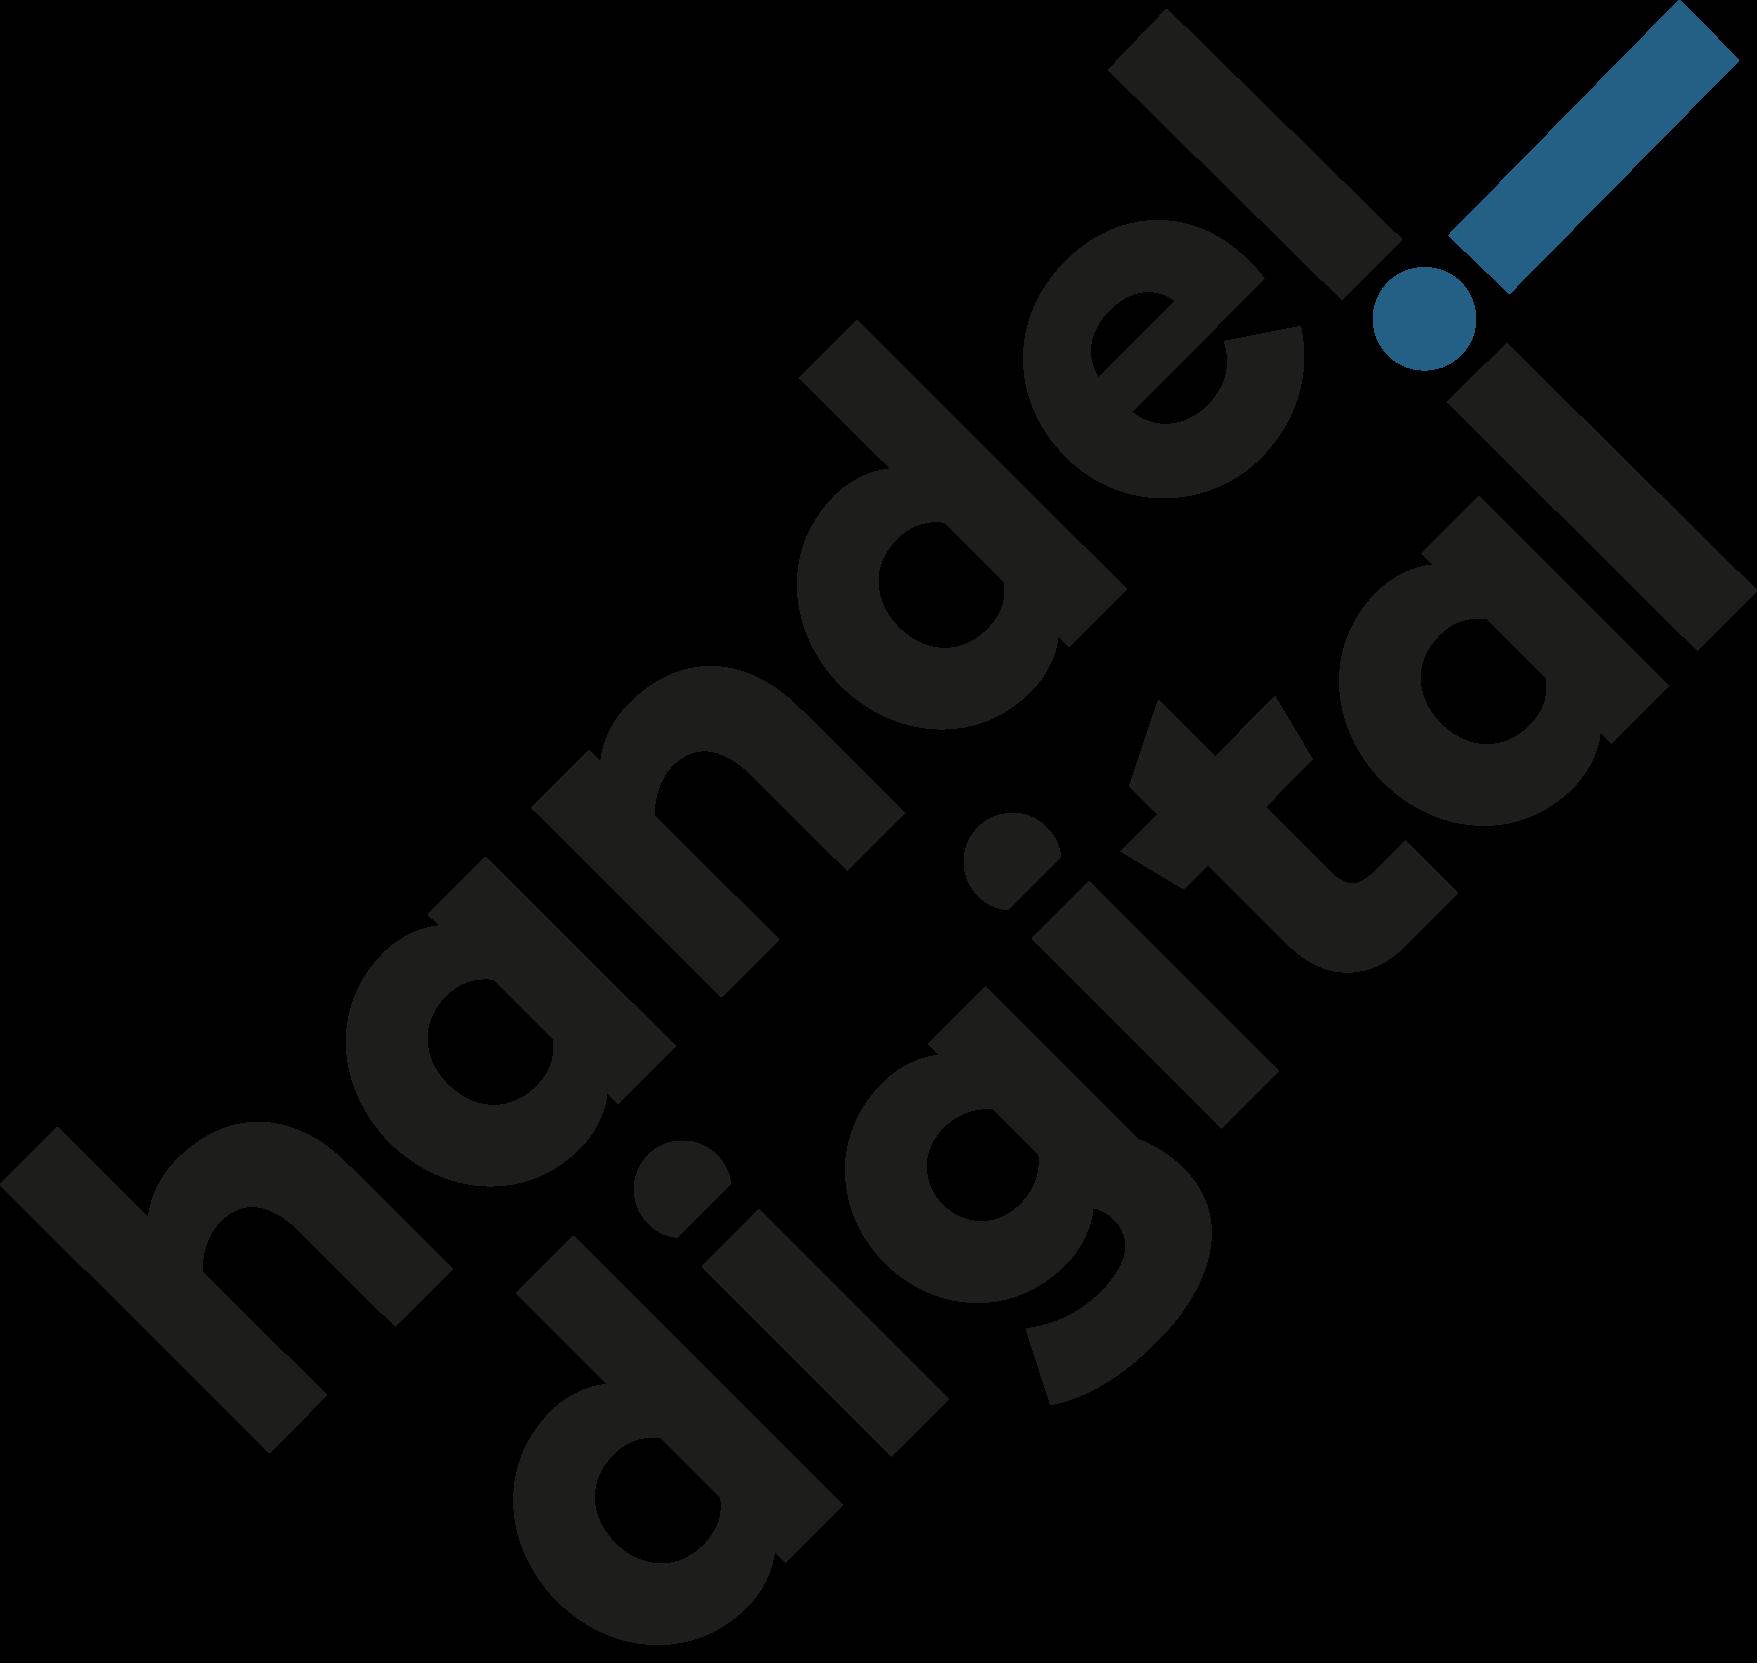 Handel Digital 5. Digi-Level der Digitalisierung